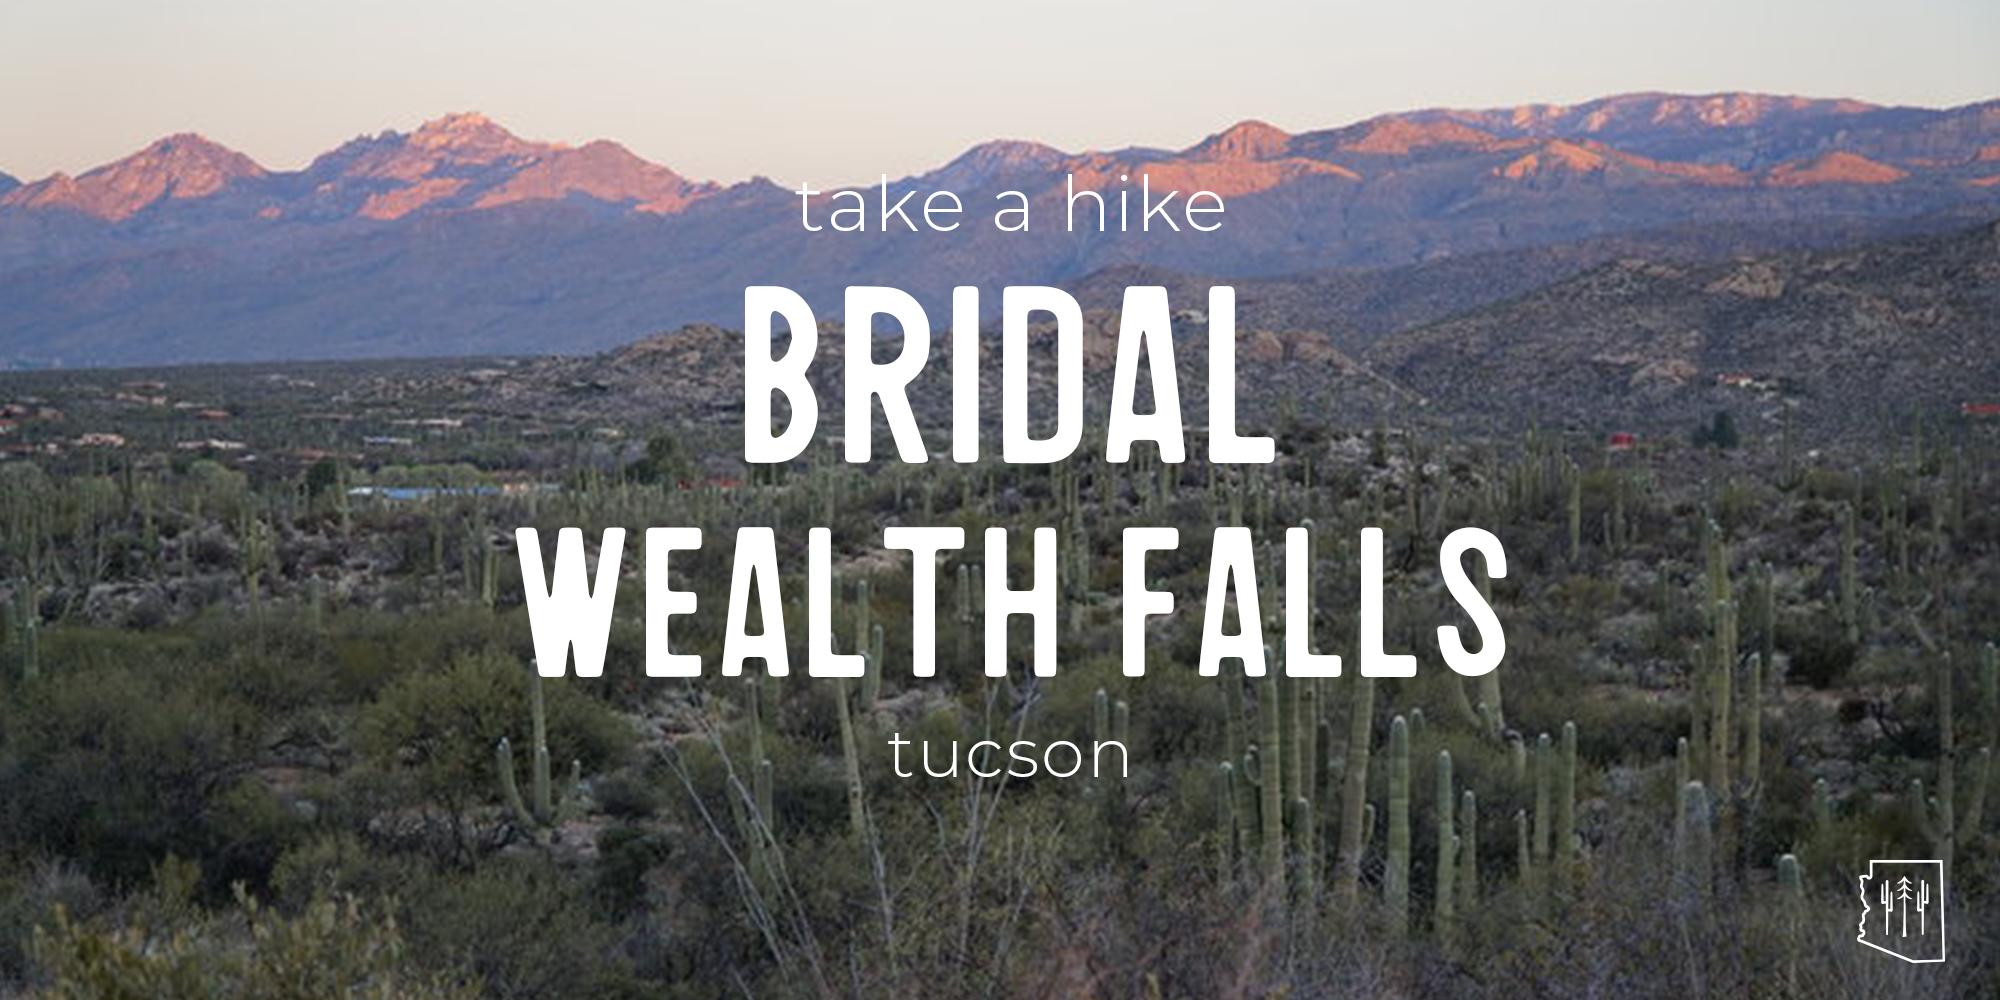 BridalWealthFalls.jpg